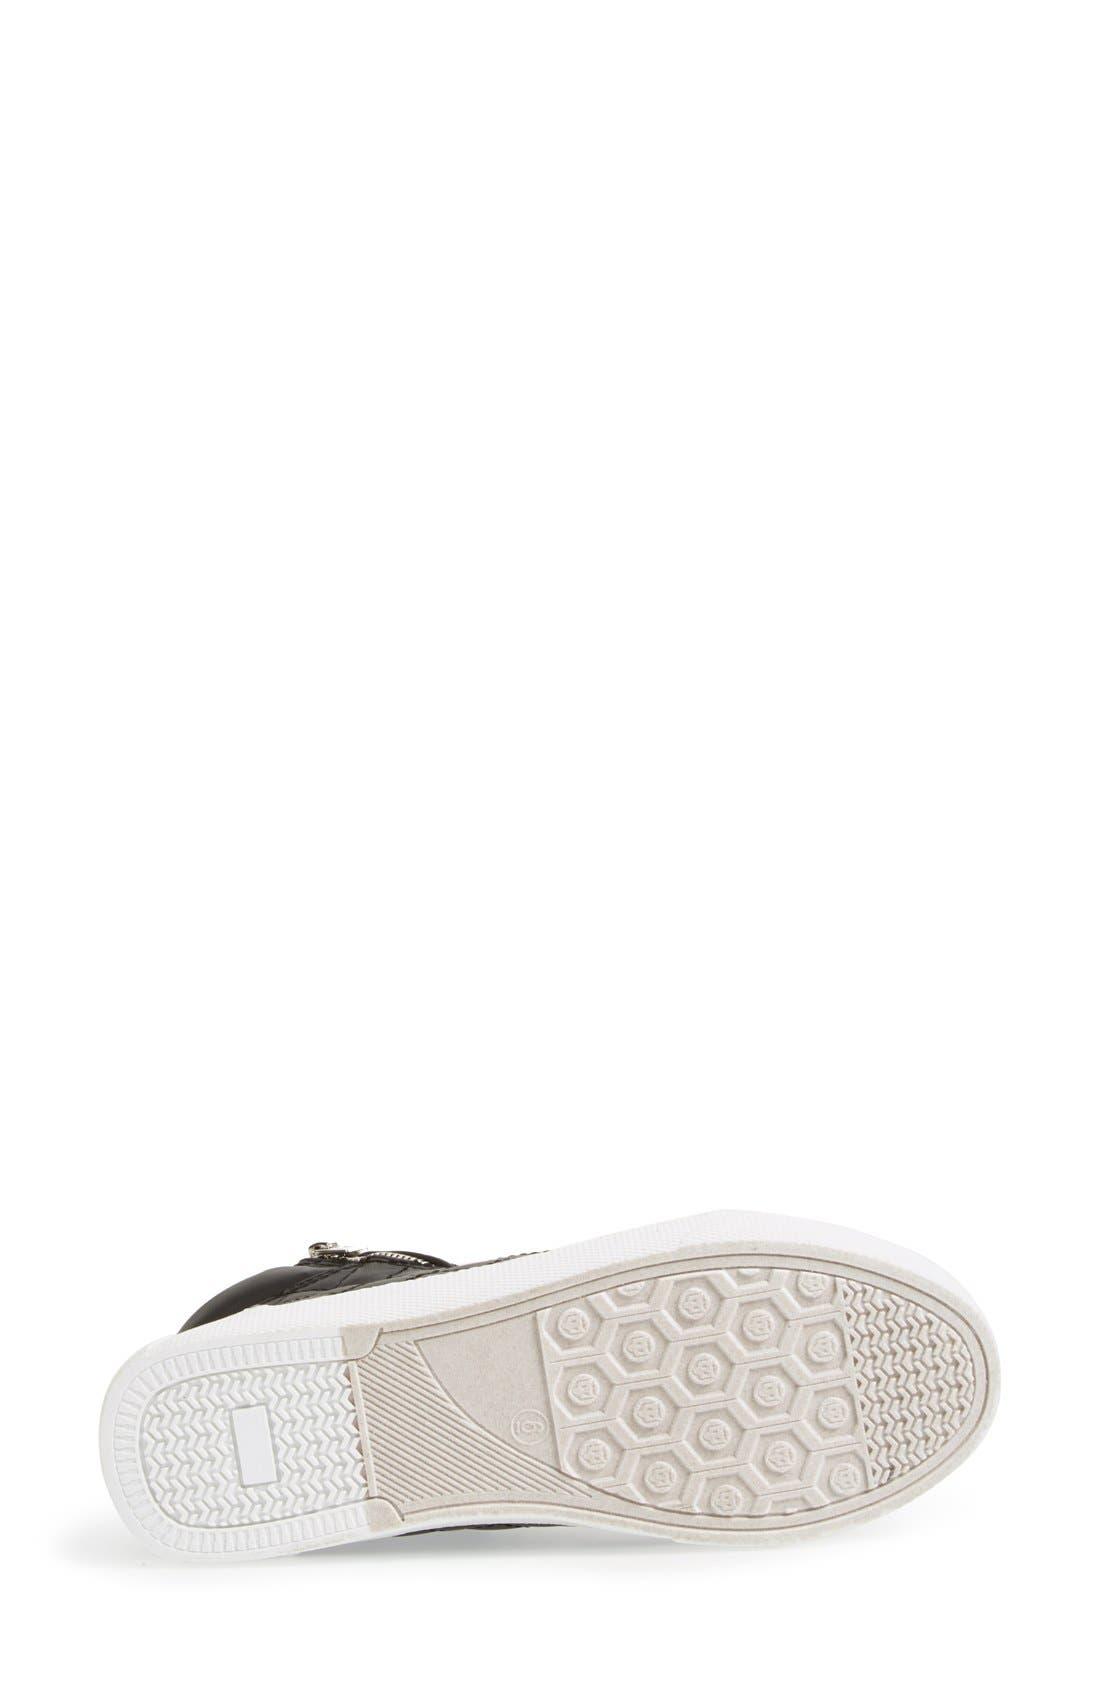 Alternate Image 4  - Steve Madden 'Decaf' Quilted High Top Sneaker (Women)